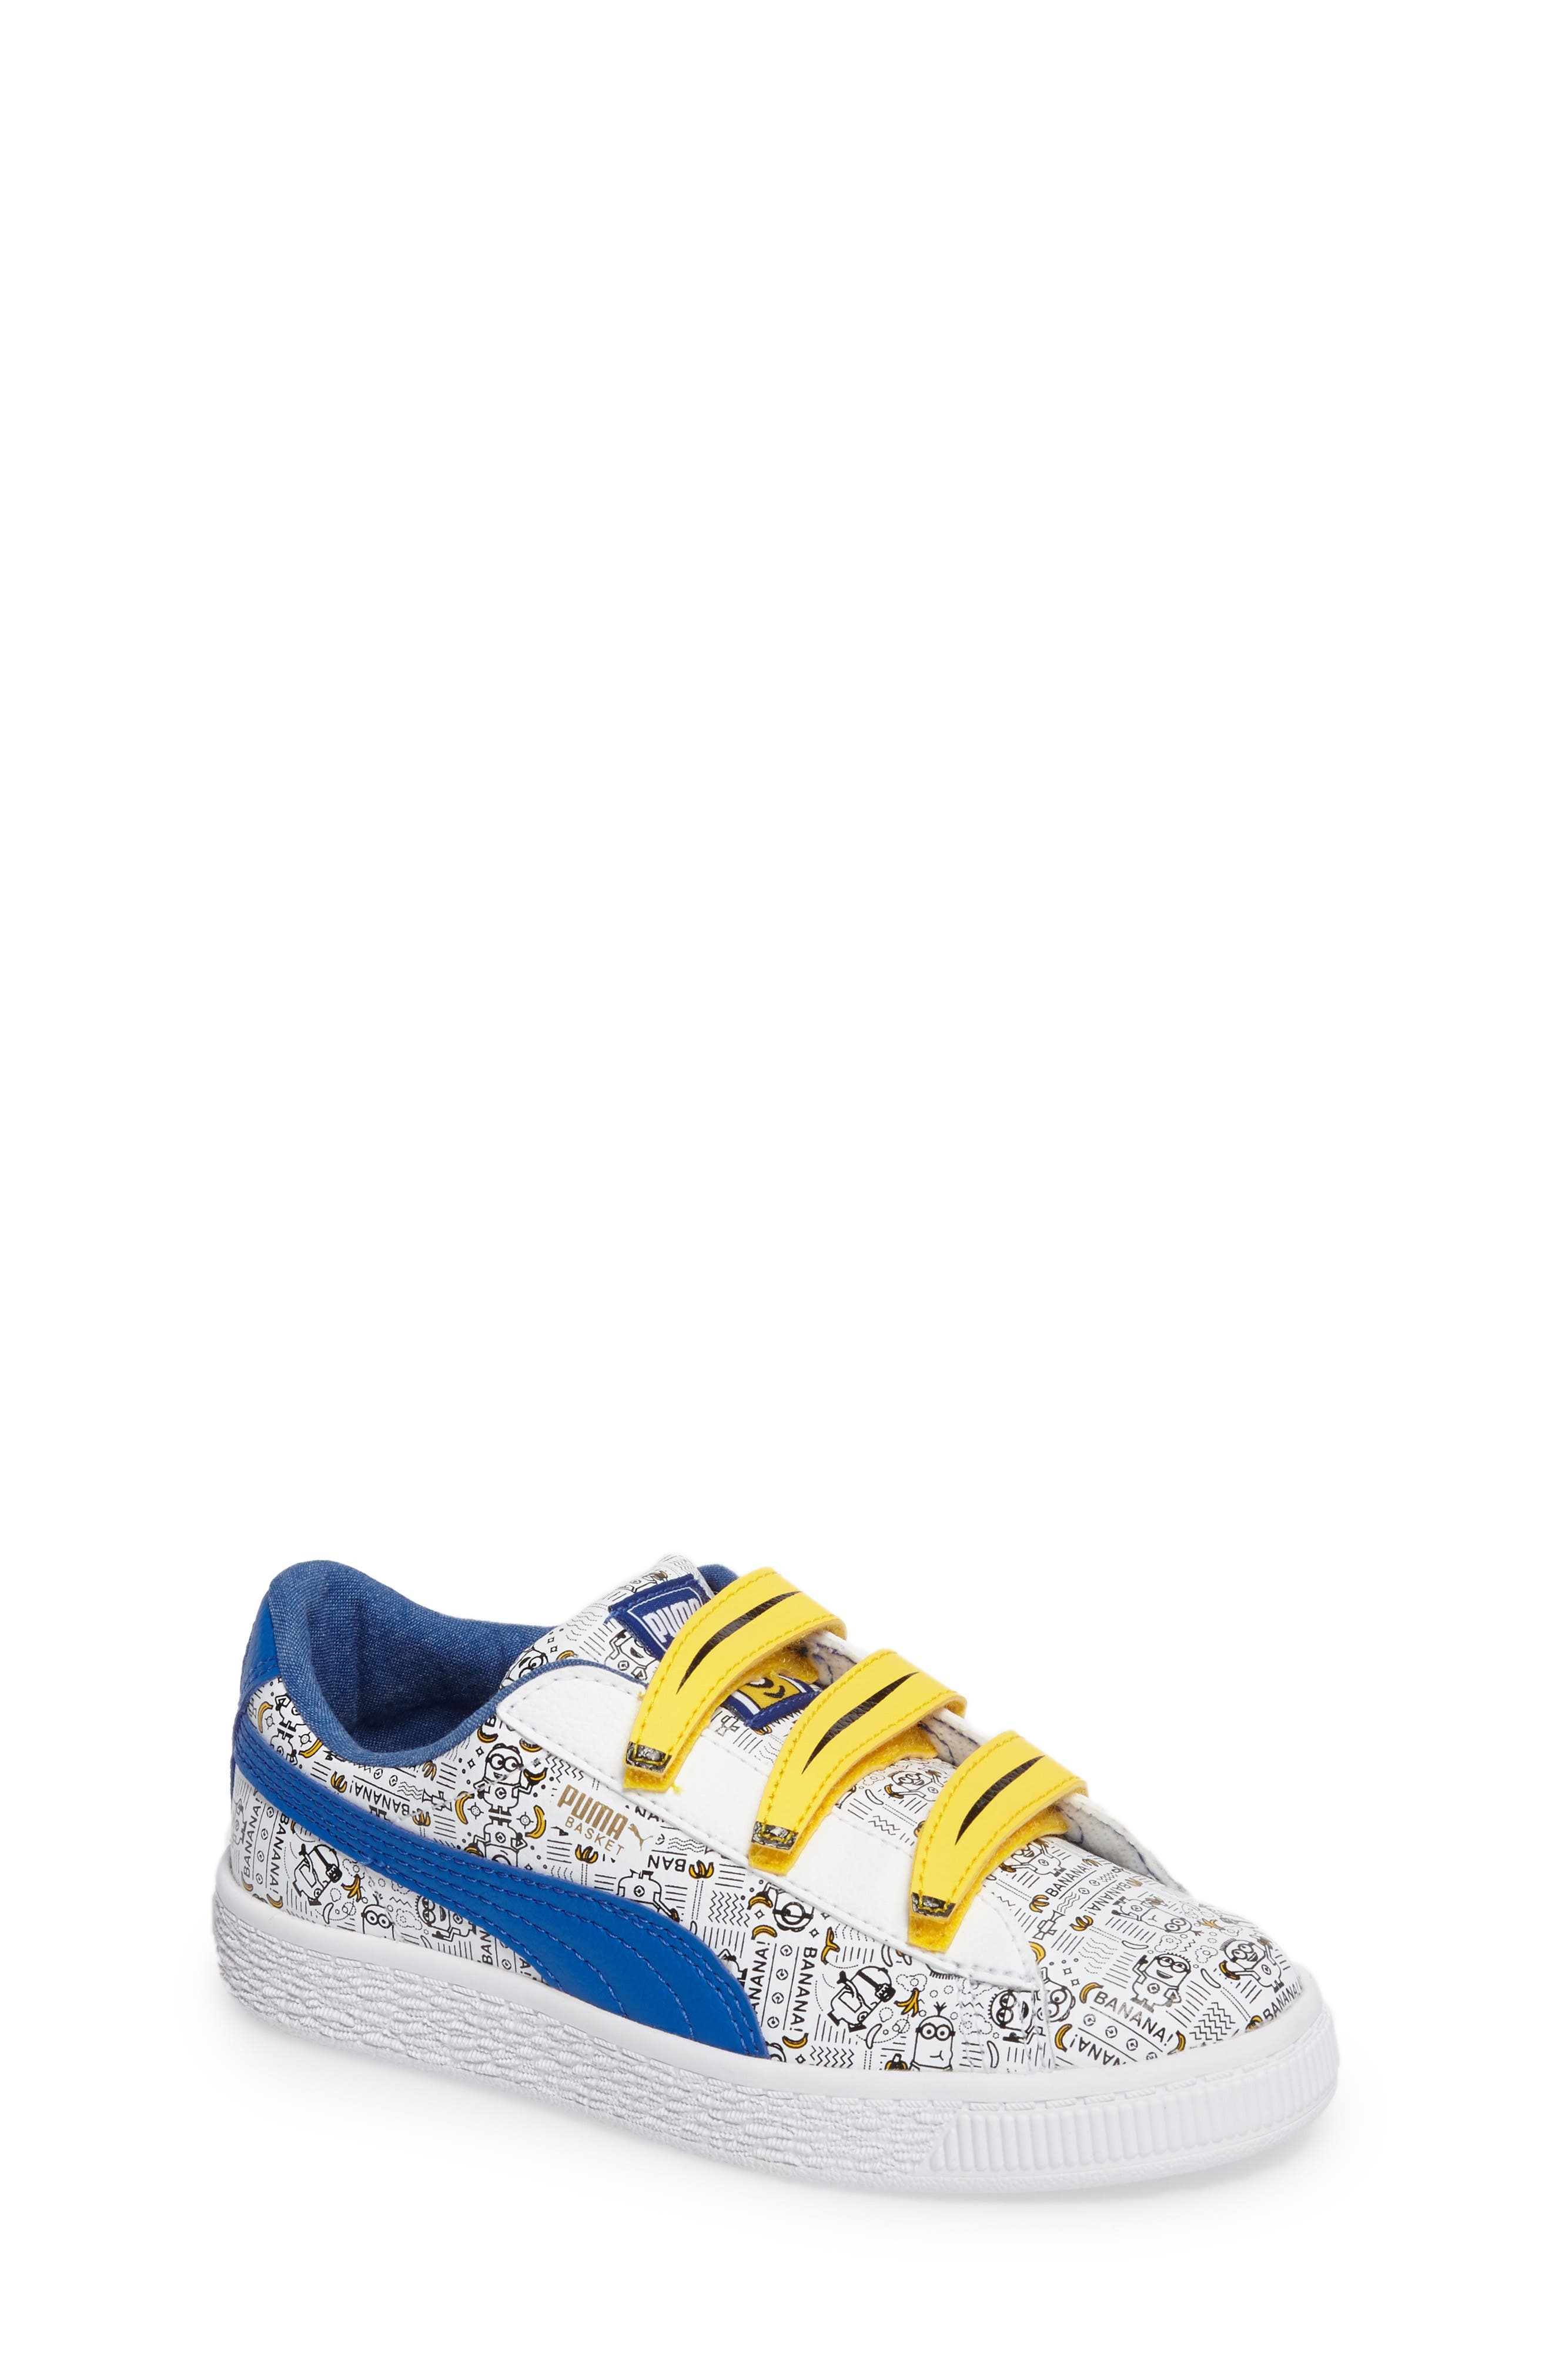 Main Image - PUMA Minions Basket V Sneaker (Toddler, Little Kid & Big Kid)